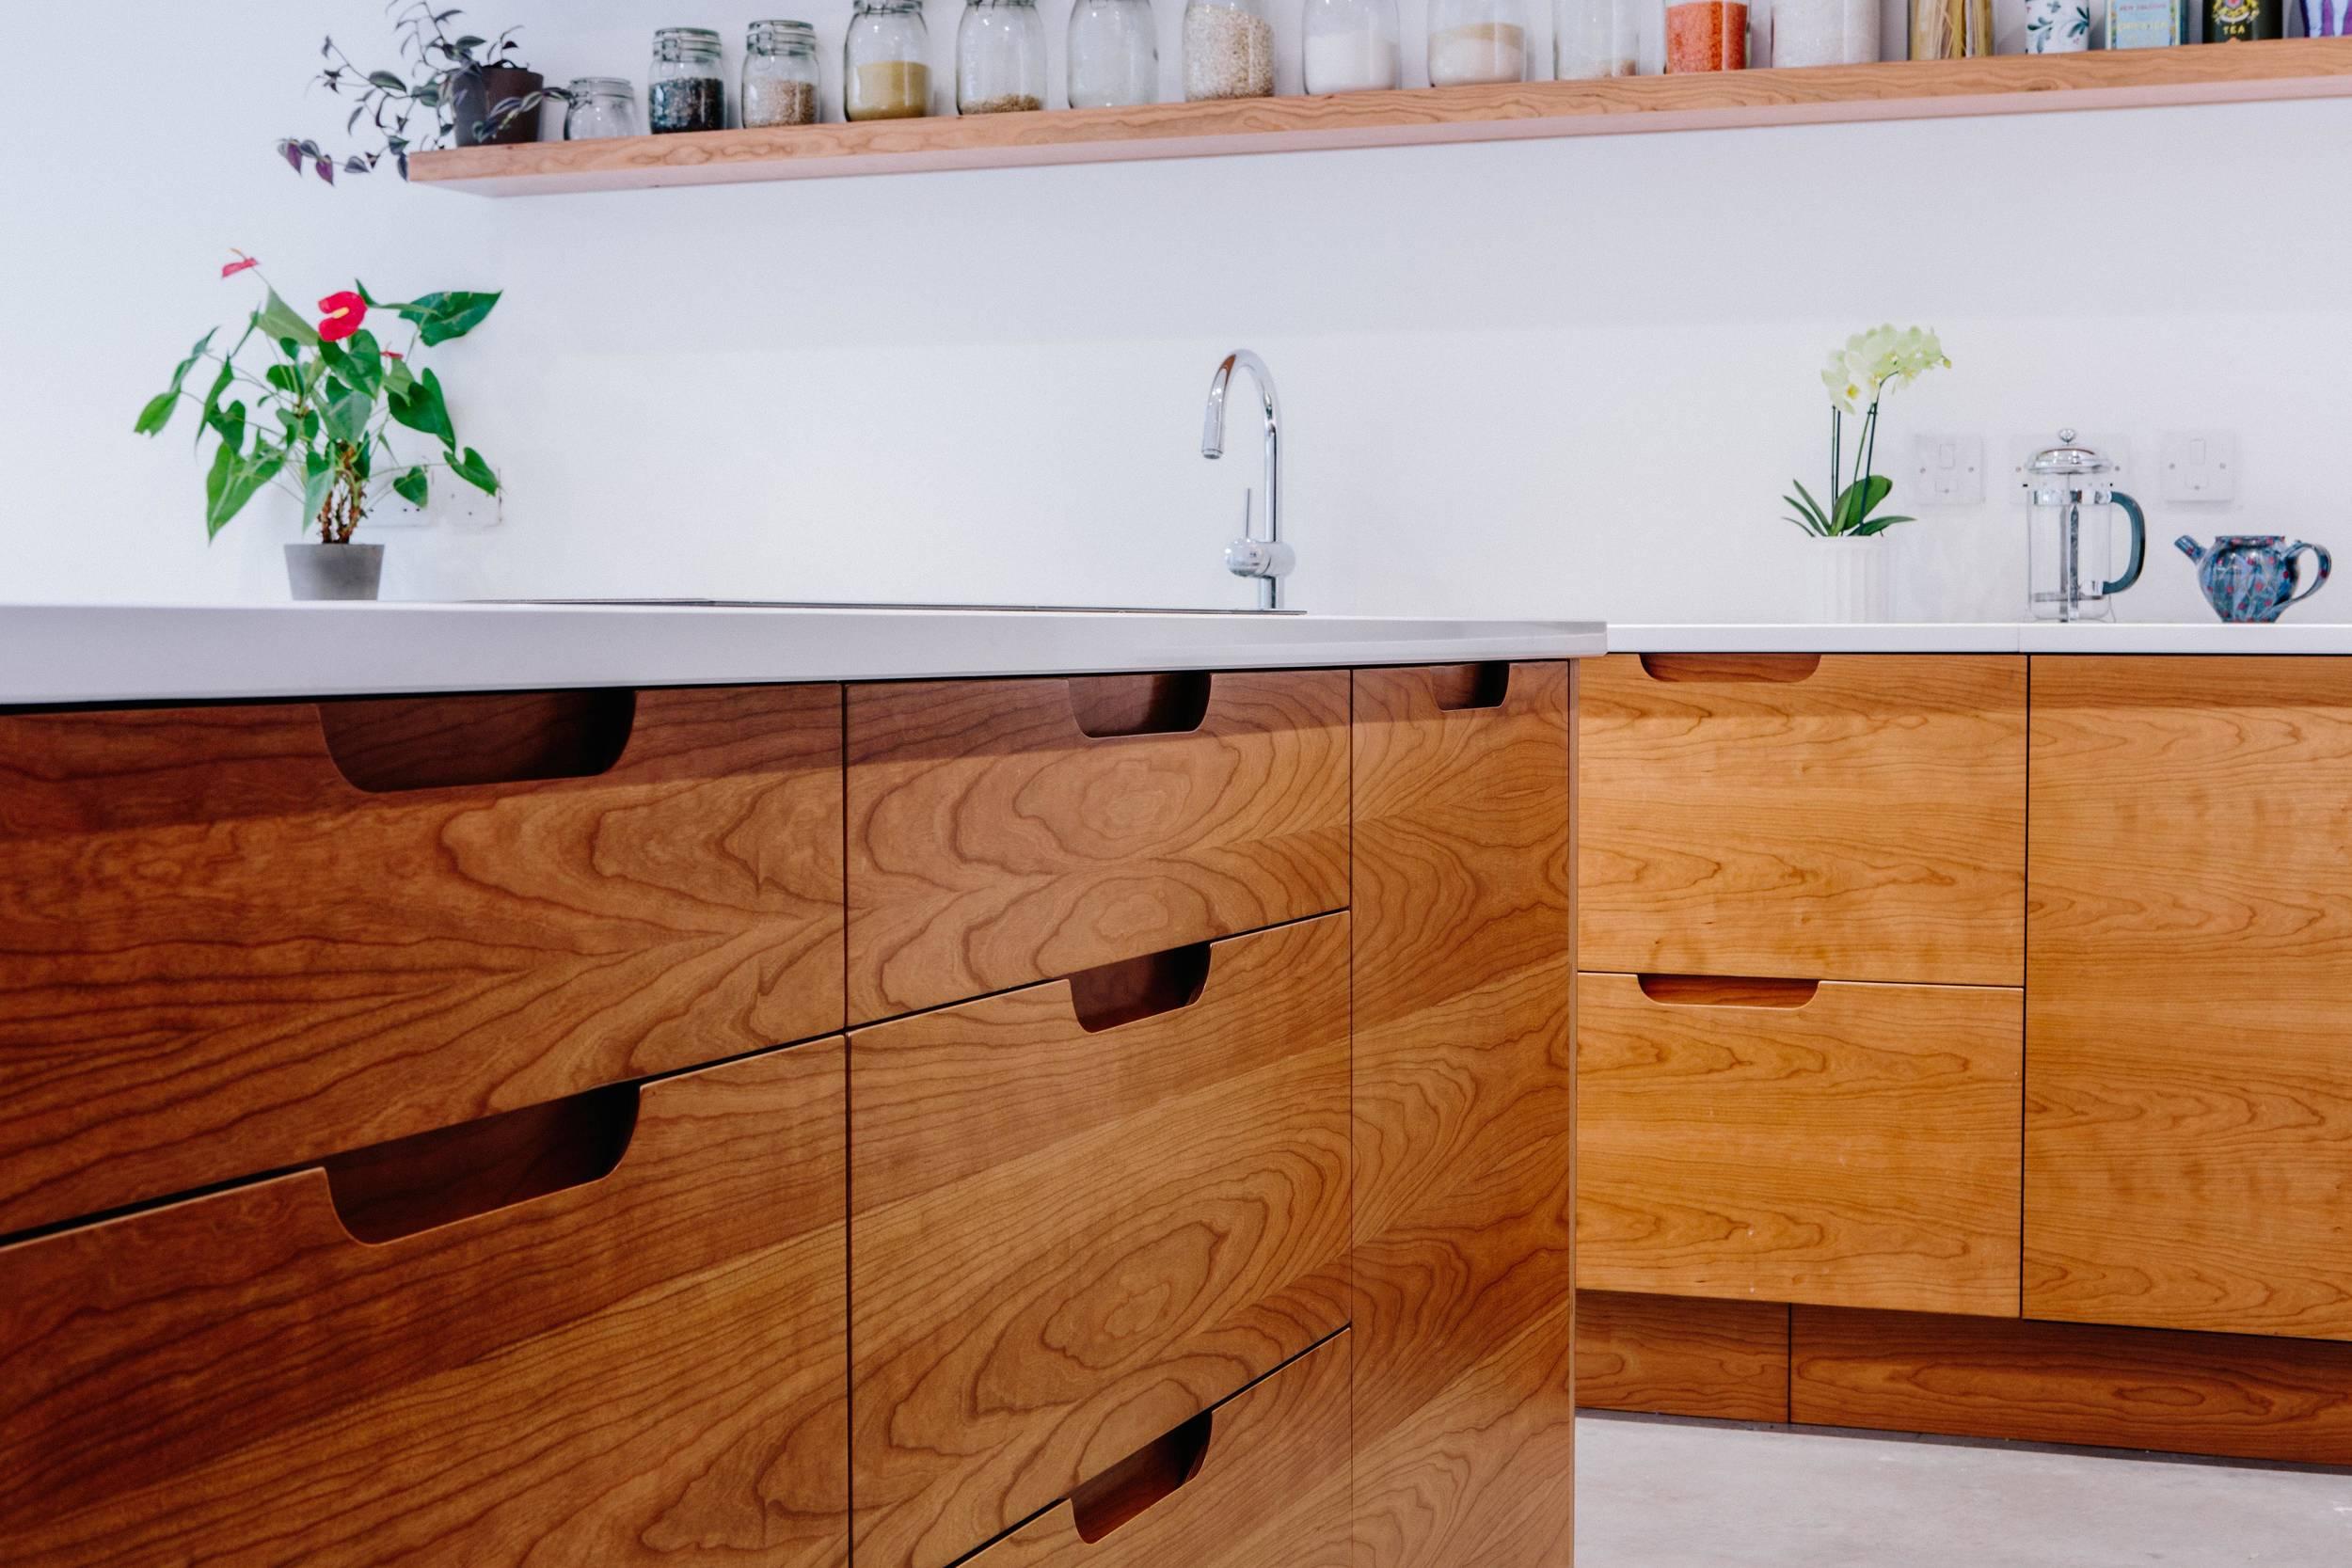 birch drawers, London, handmade, shaker kitchen, modern design, bespoke